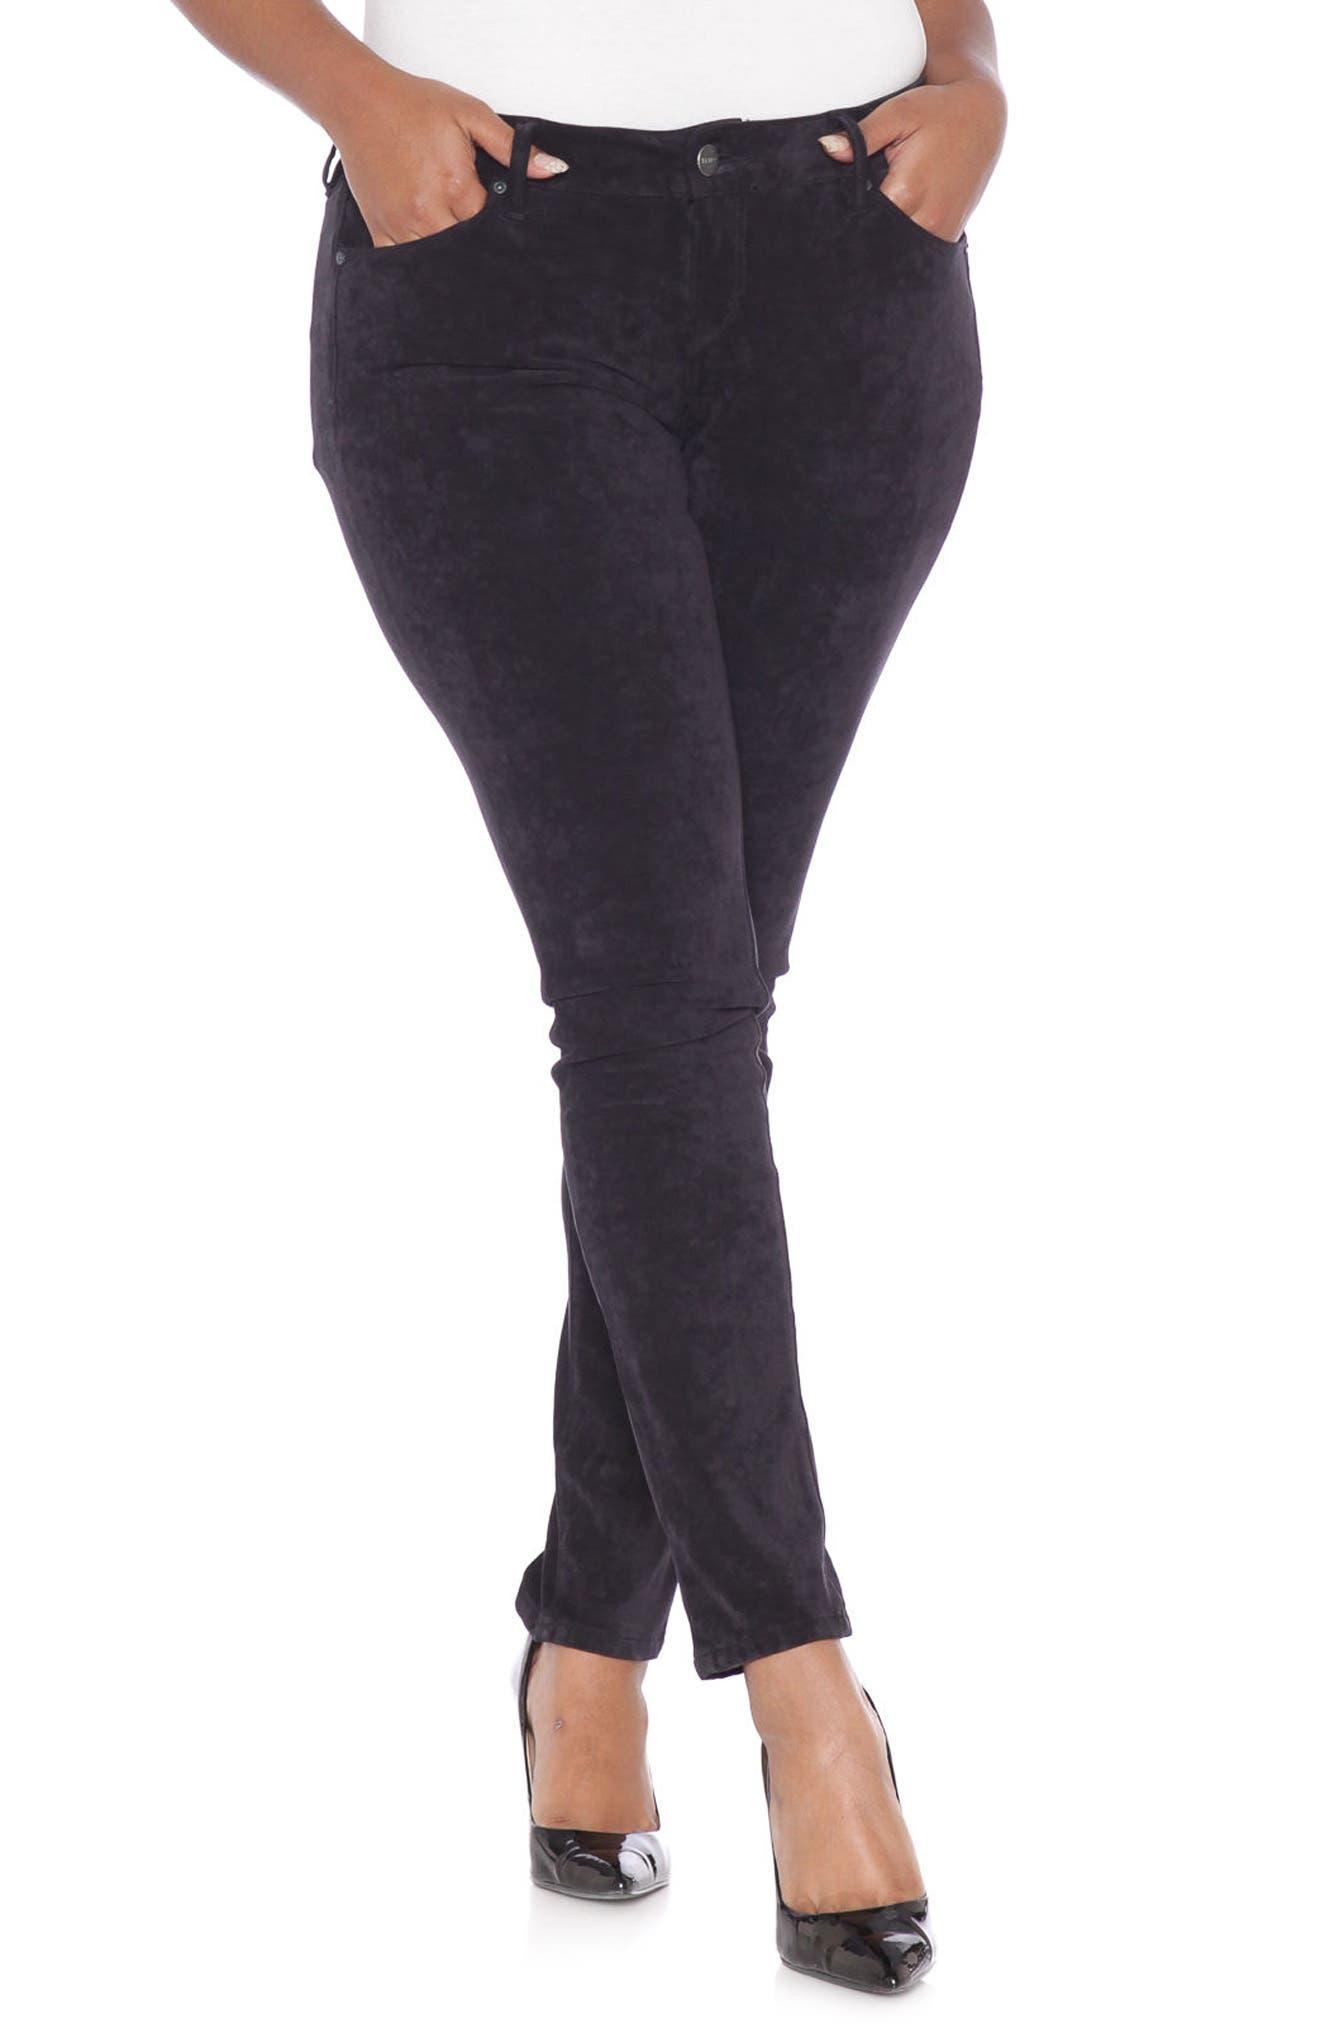 SLINK JEANS Slink Sueded Skinny Jeans